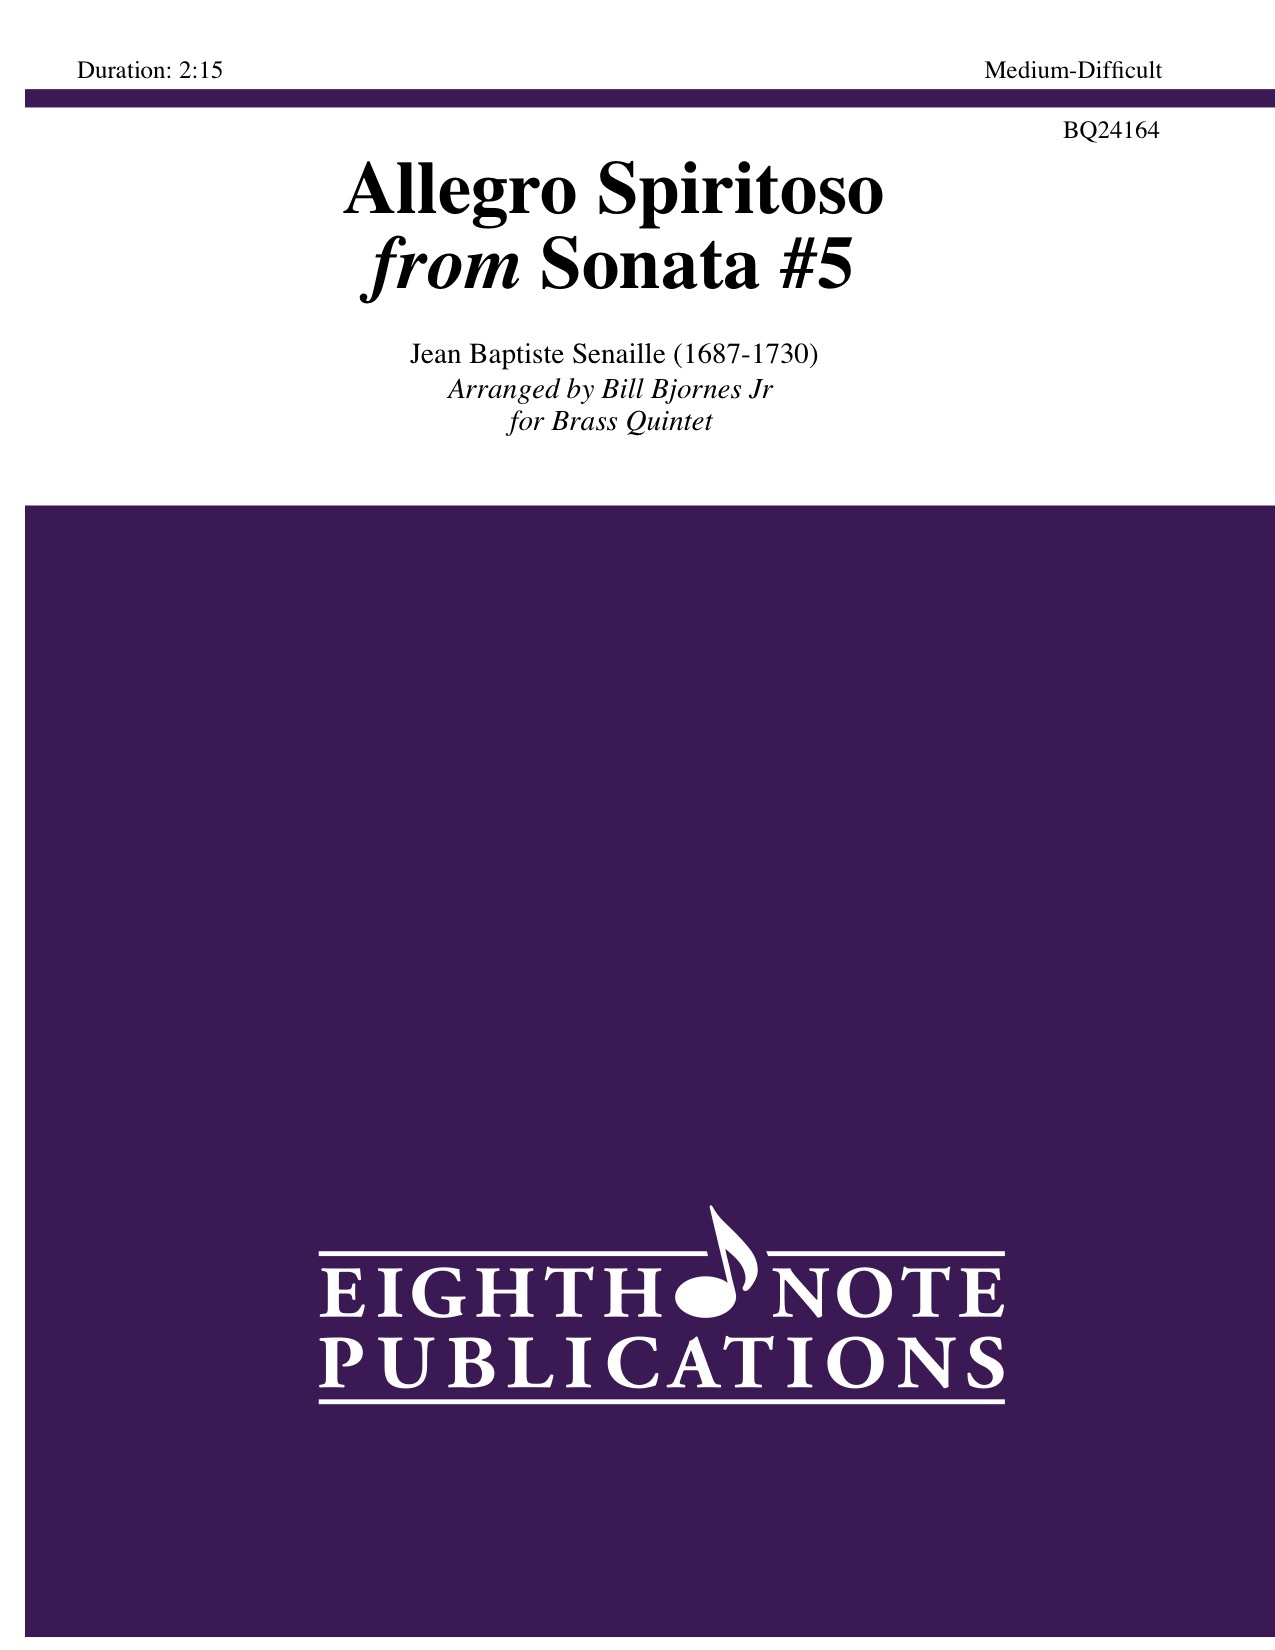 Allegro Spiritoso from Sonata #5 - Jean Baptiste Senaille